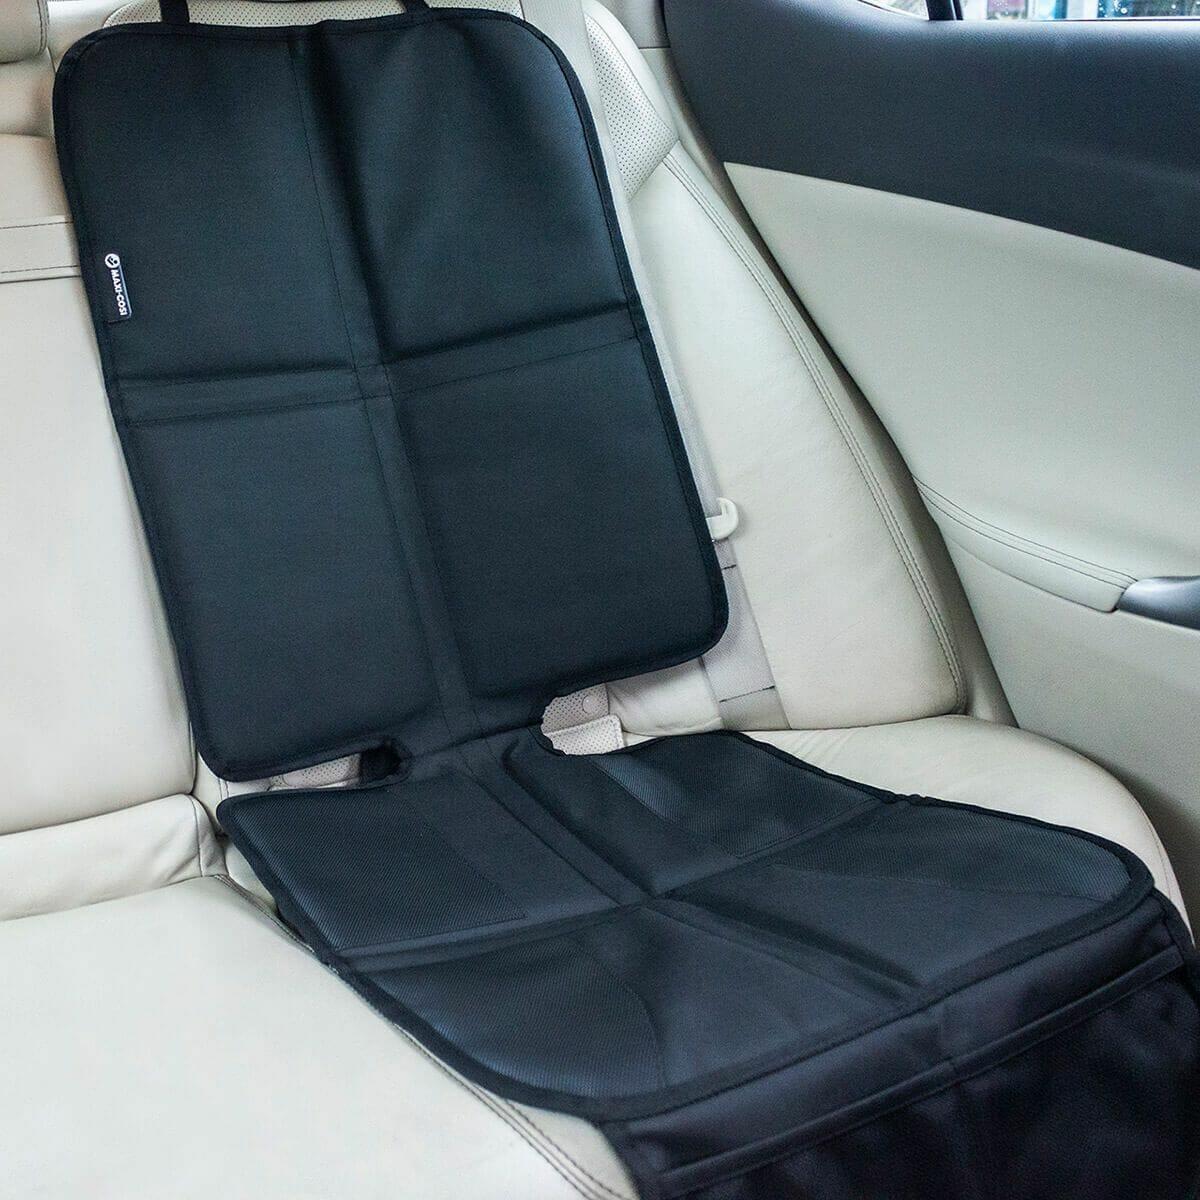 Maxi Cosi Car Seat Protector Mat Deluxe In Car